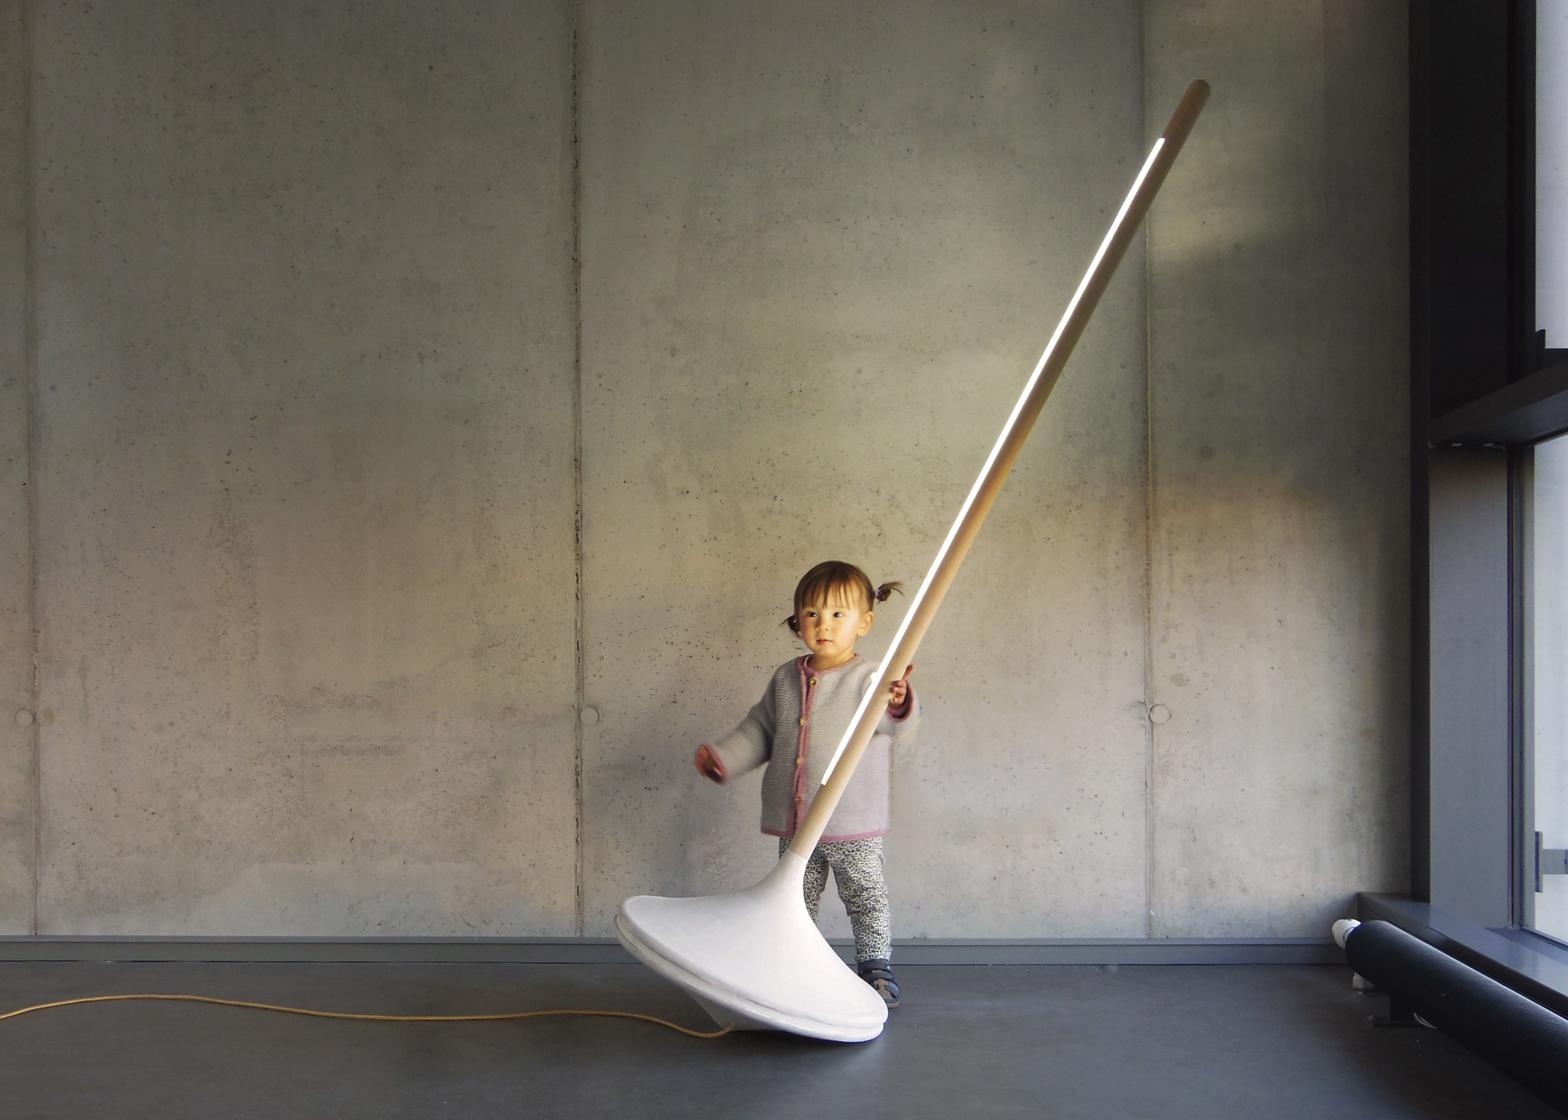 Pumpal Light Resembling Kids' Spinning Top Toys